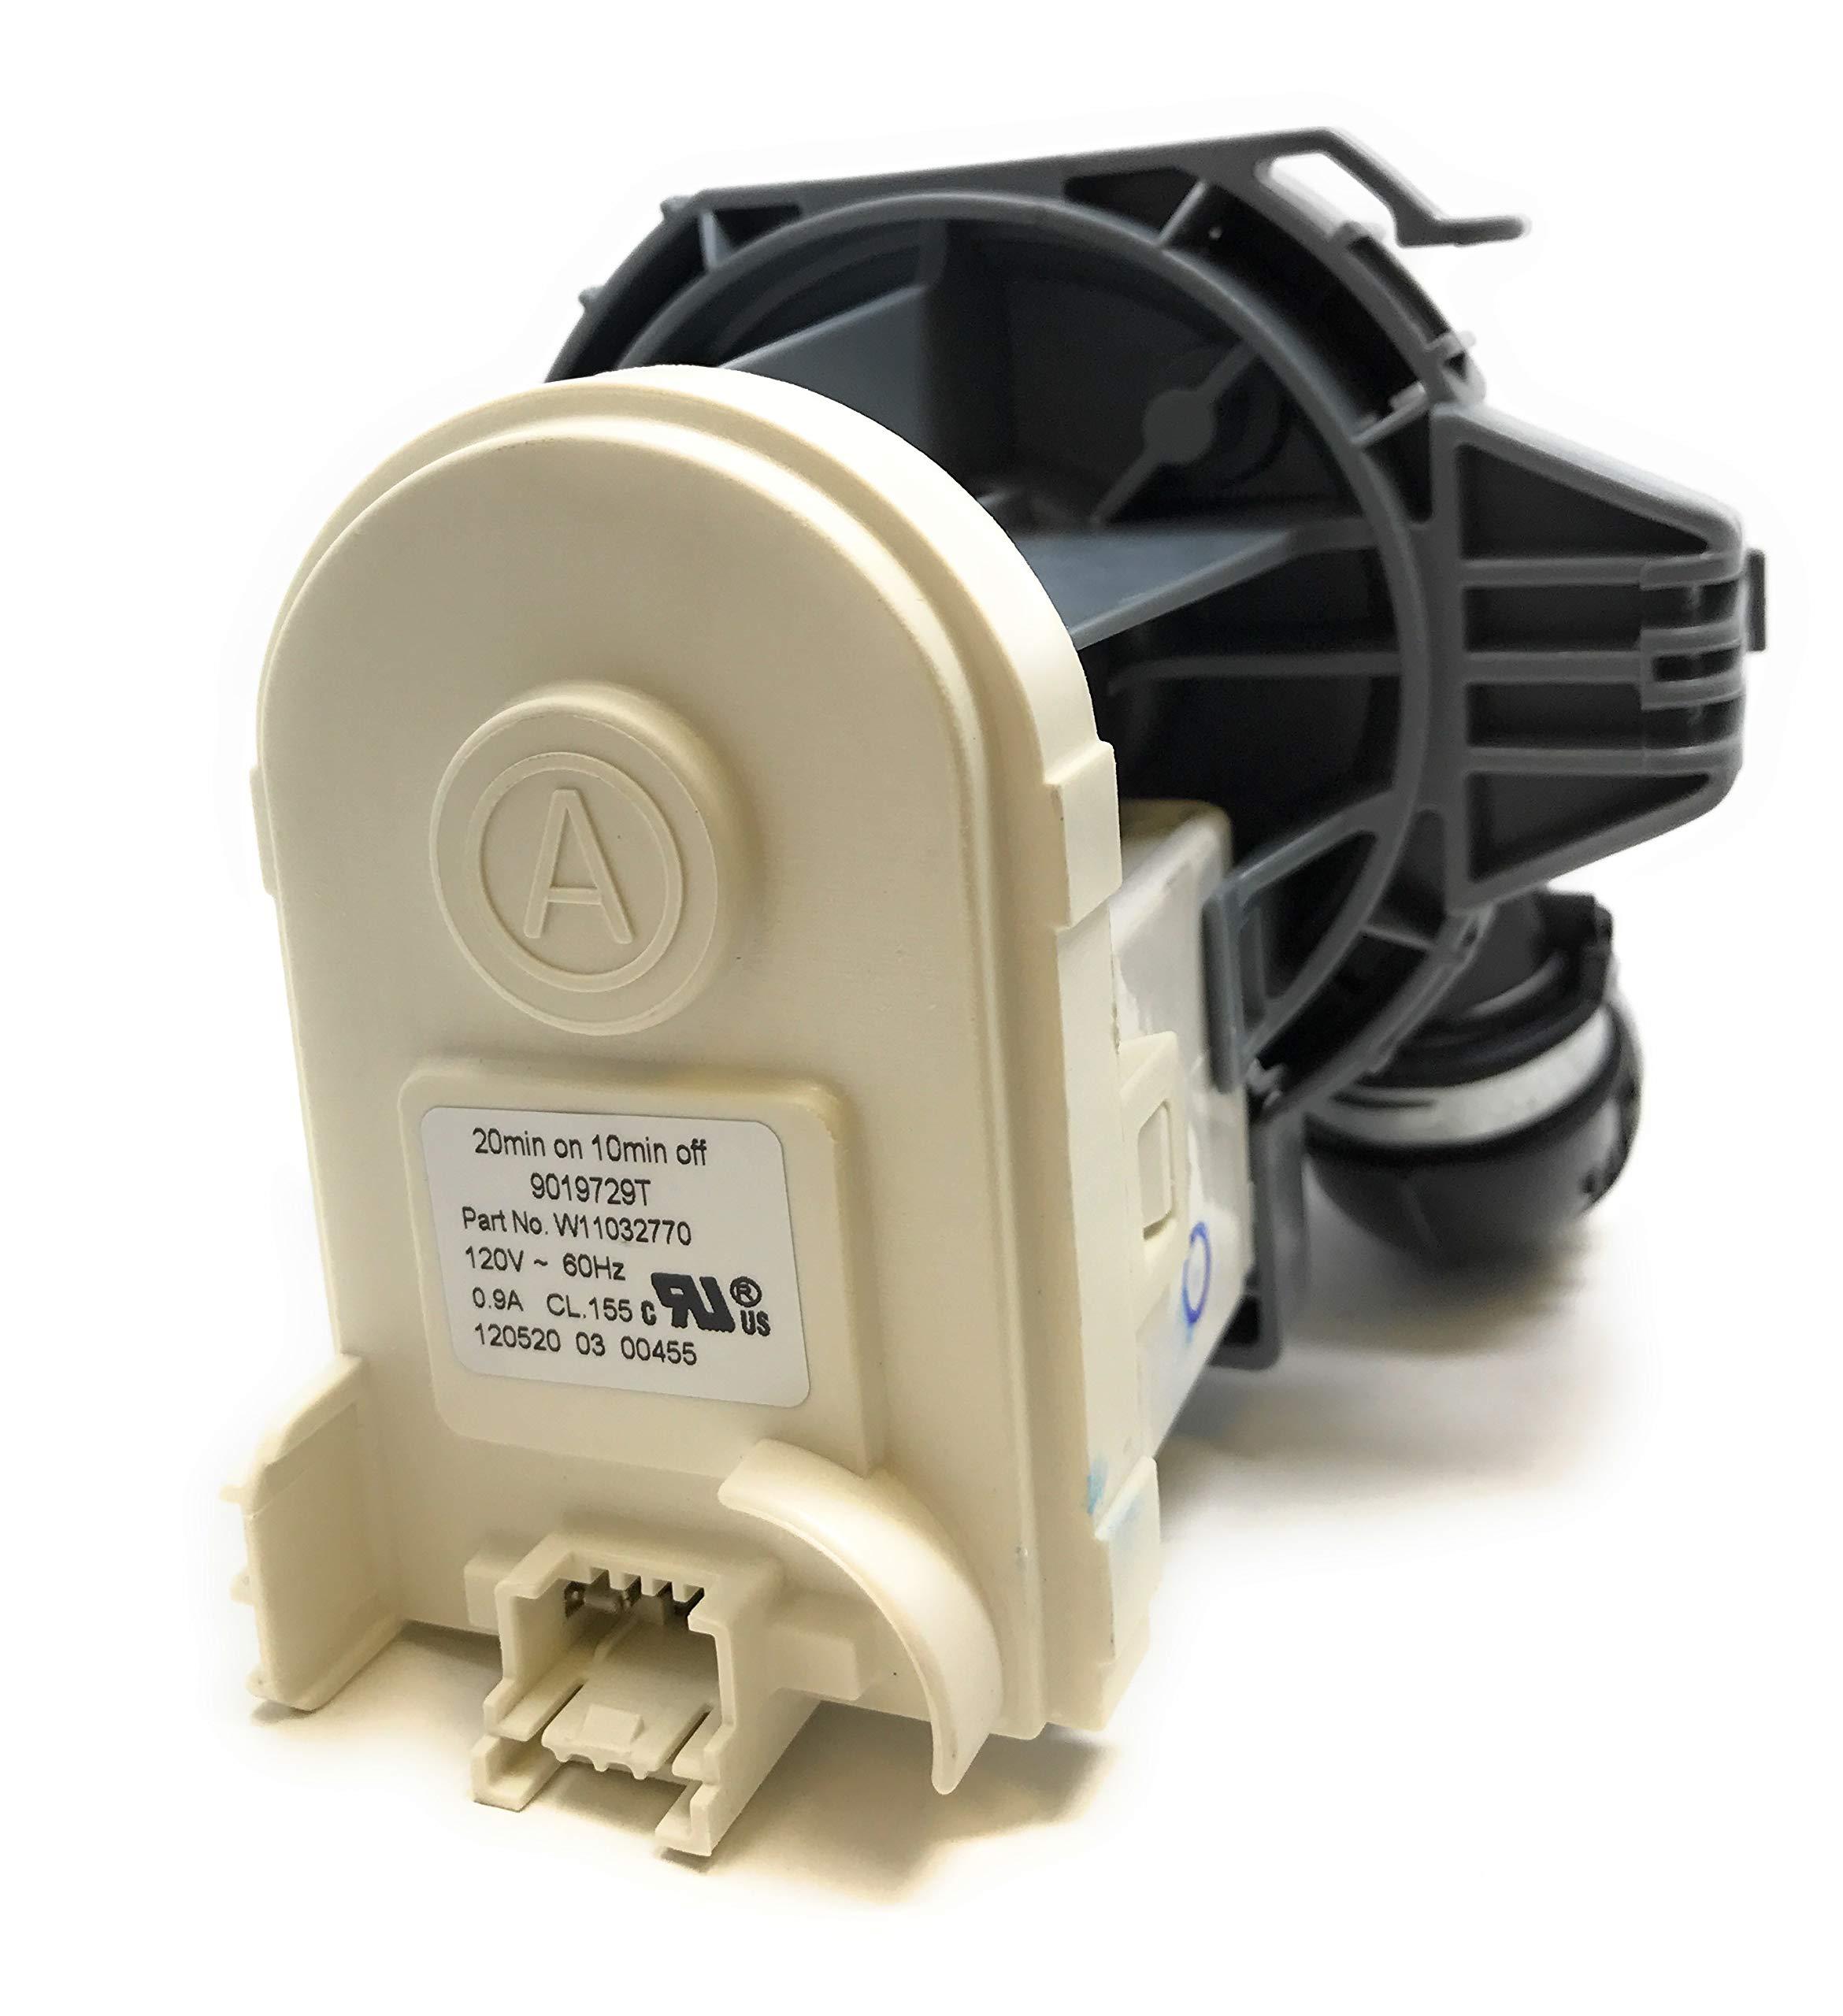 Dishwasher Circulation Pump Oem W11032770 Home Improvement Amazon Com